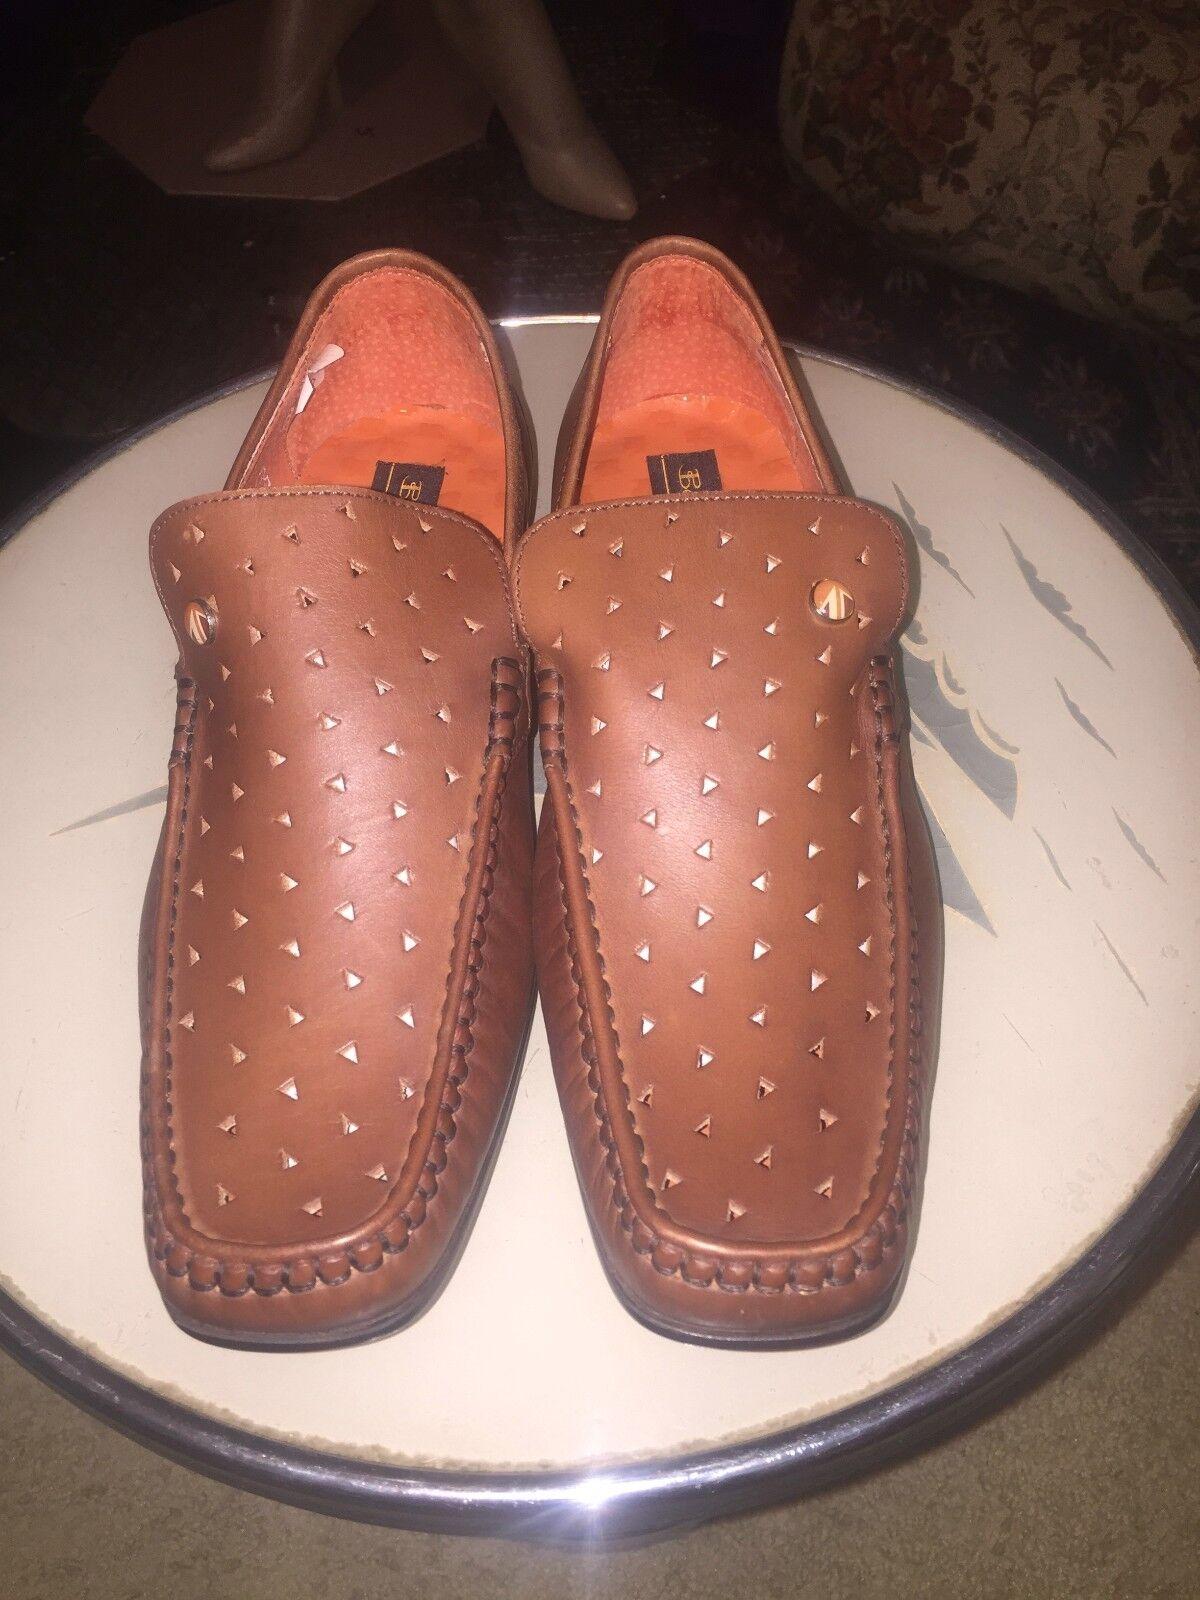 Ben Sherhomme, Berwick cognac chaussures, View Factory.